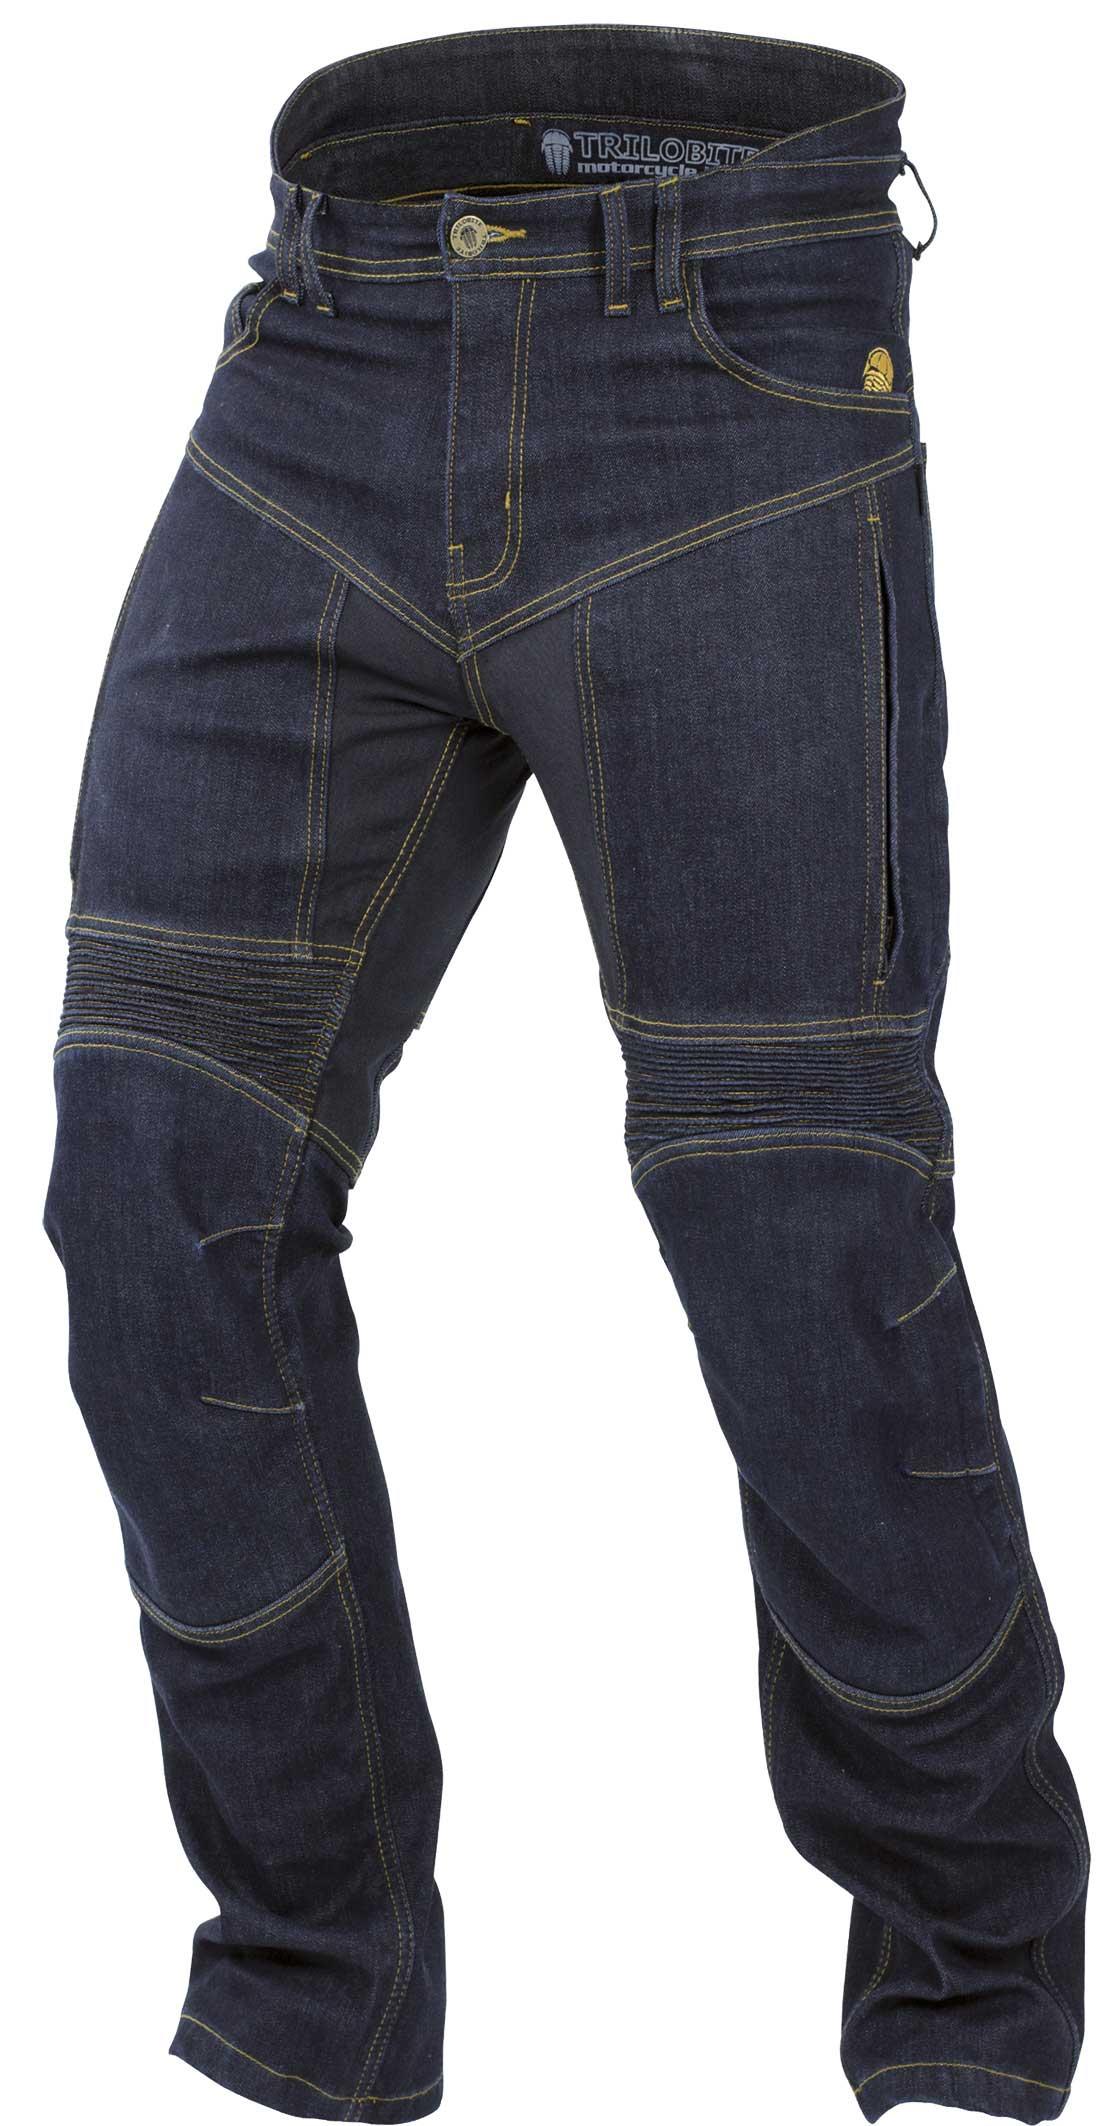 trilobite kevlar jeans agnox wasserdicht herren lang cs. Black Bedroom Furniture Sets. Home Design Ideas